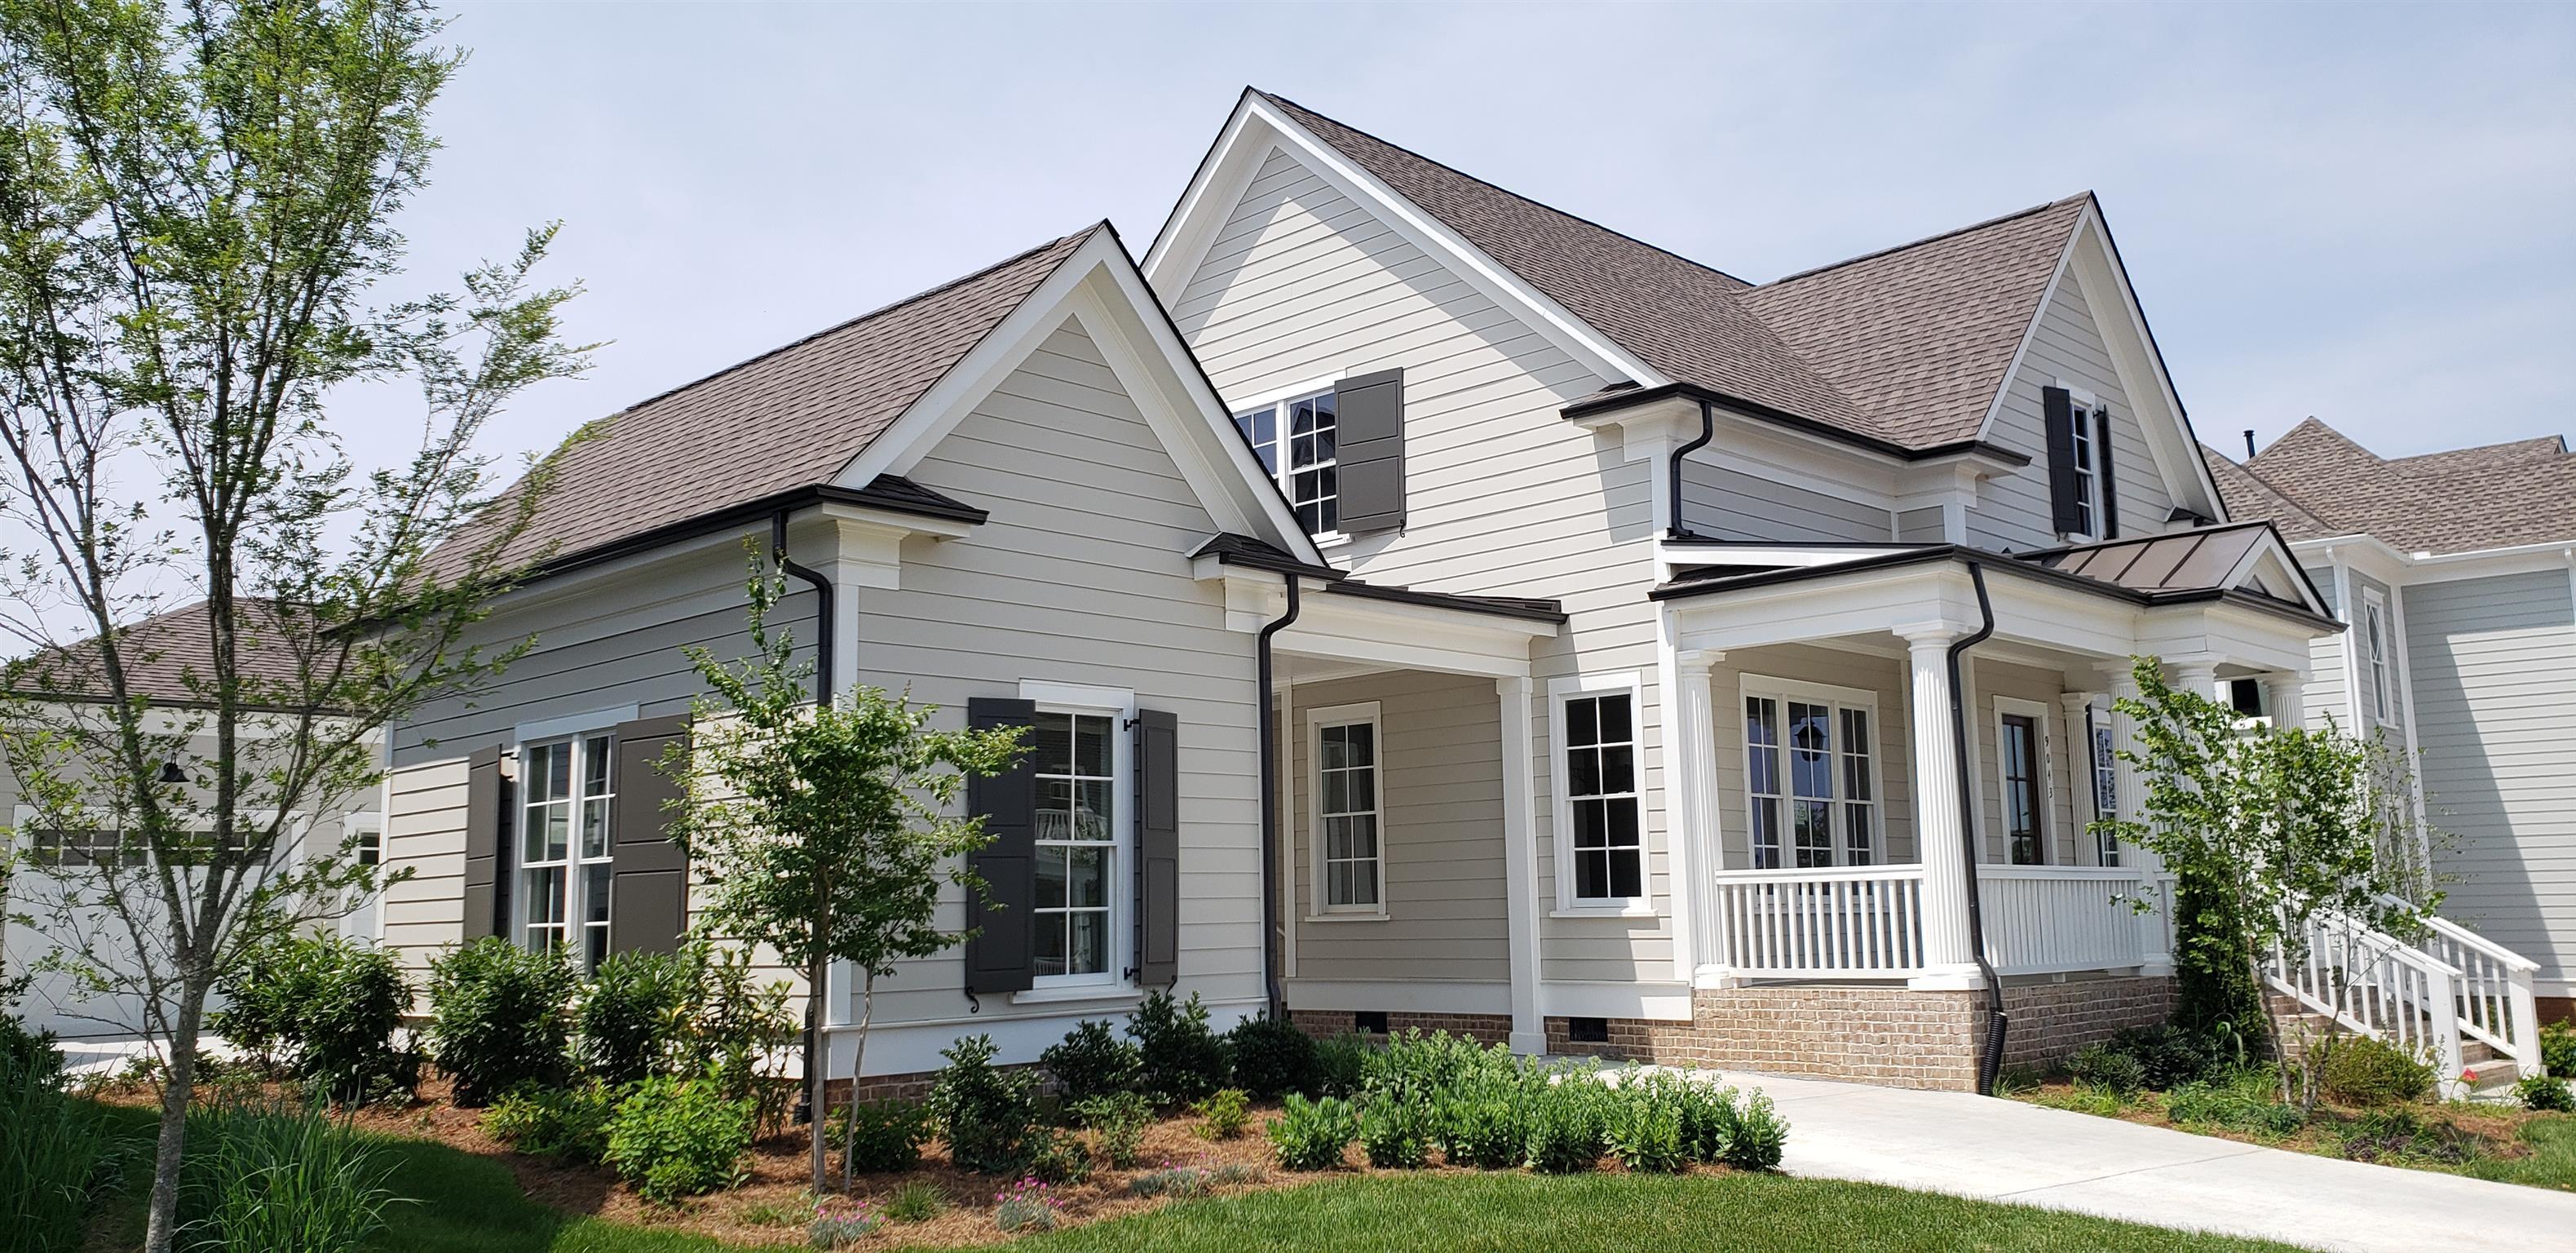 9043 Berry Farms Crossing, Franklin, TN 37064 - Franklin, TN real estate listing